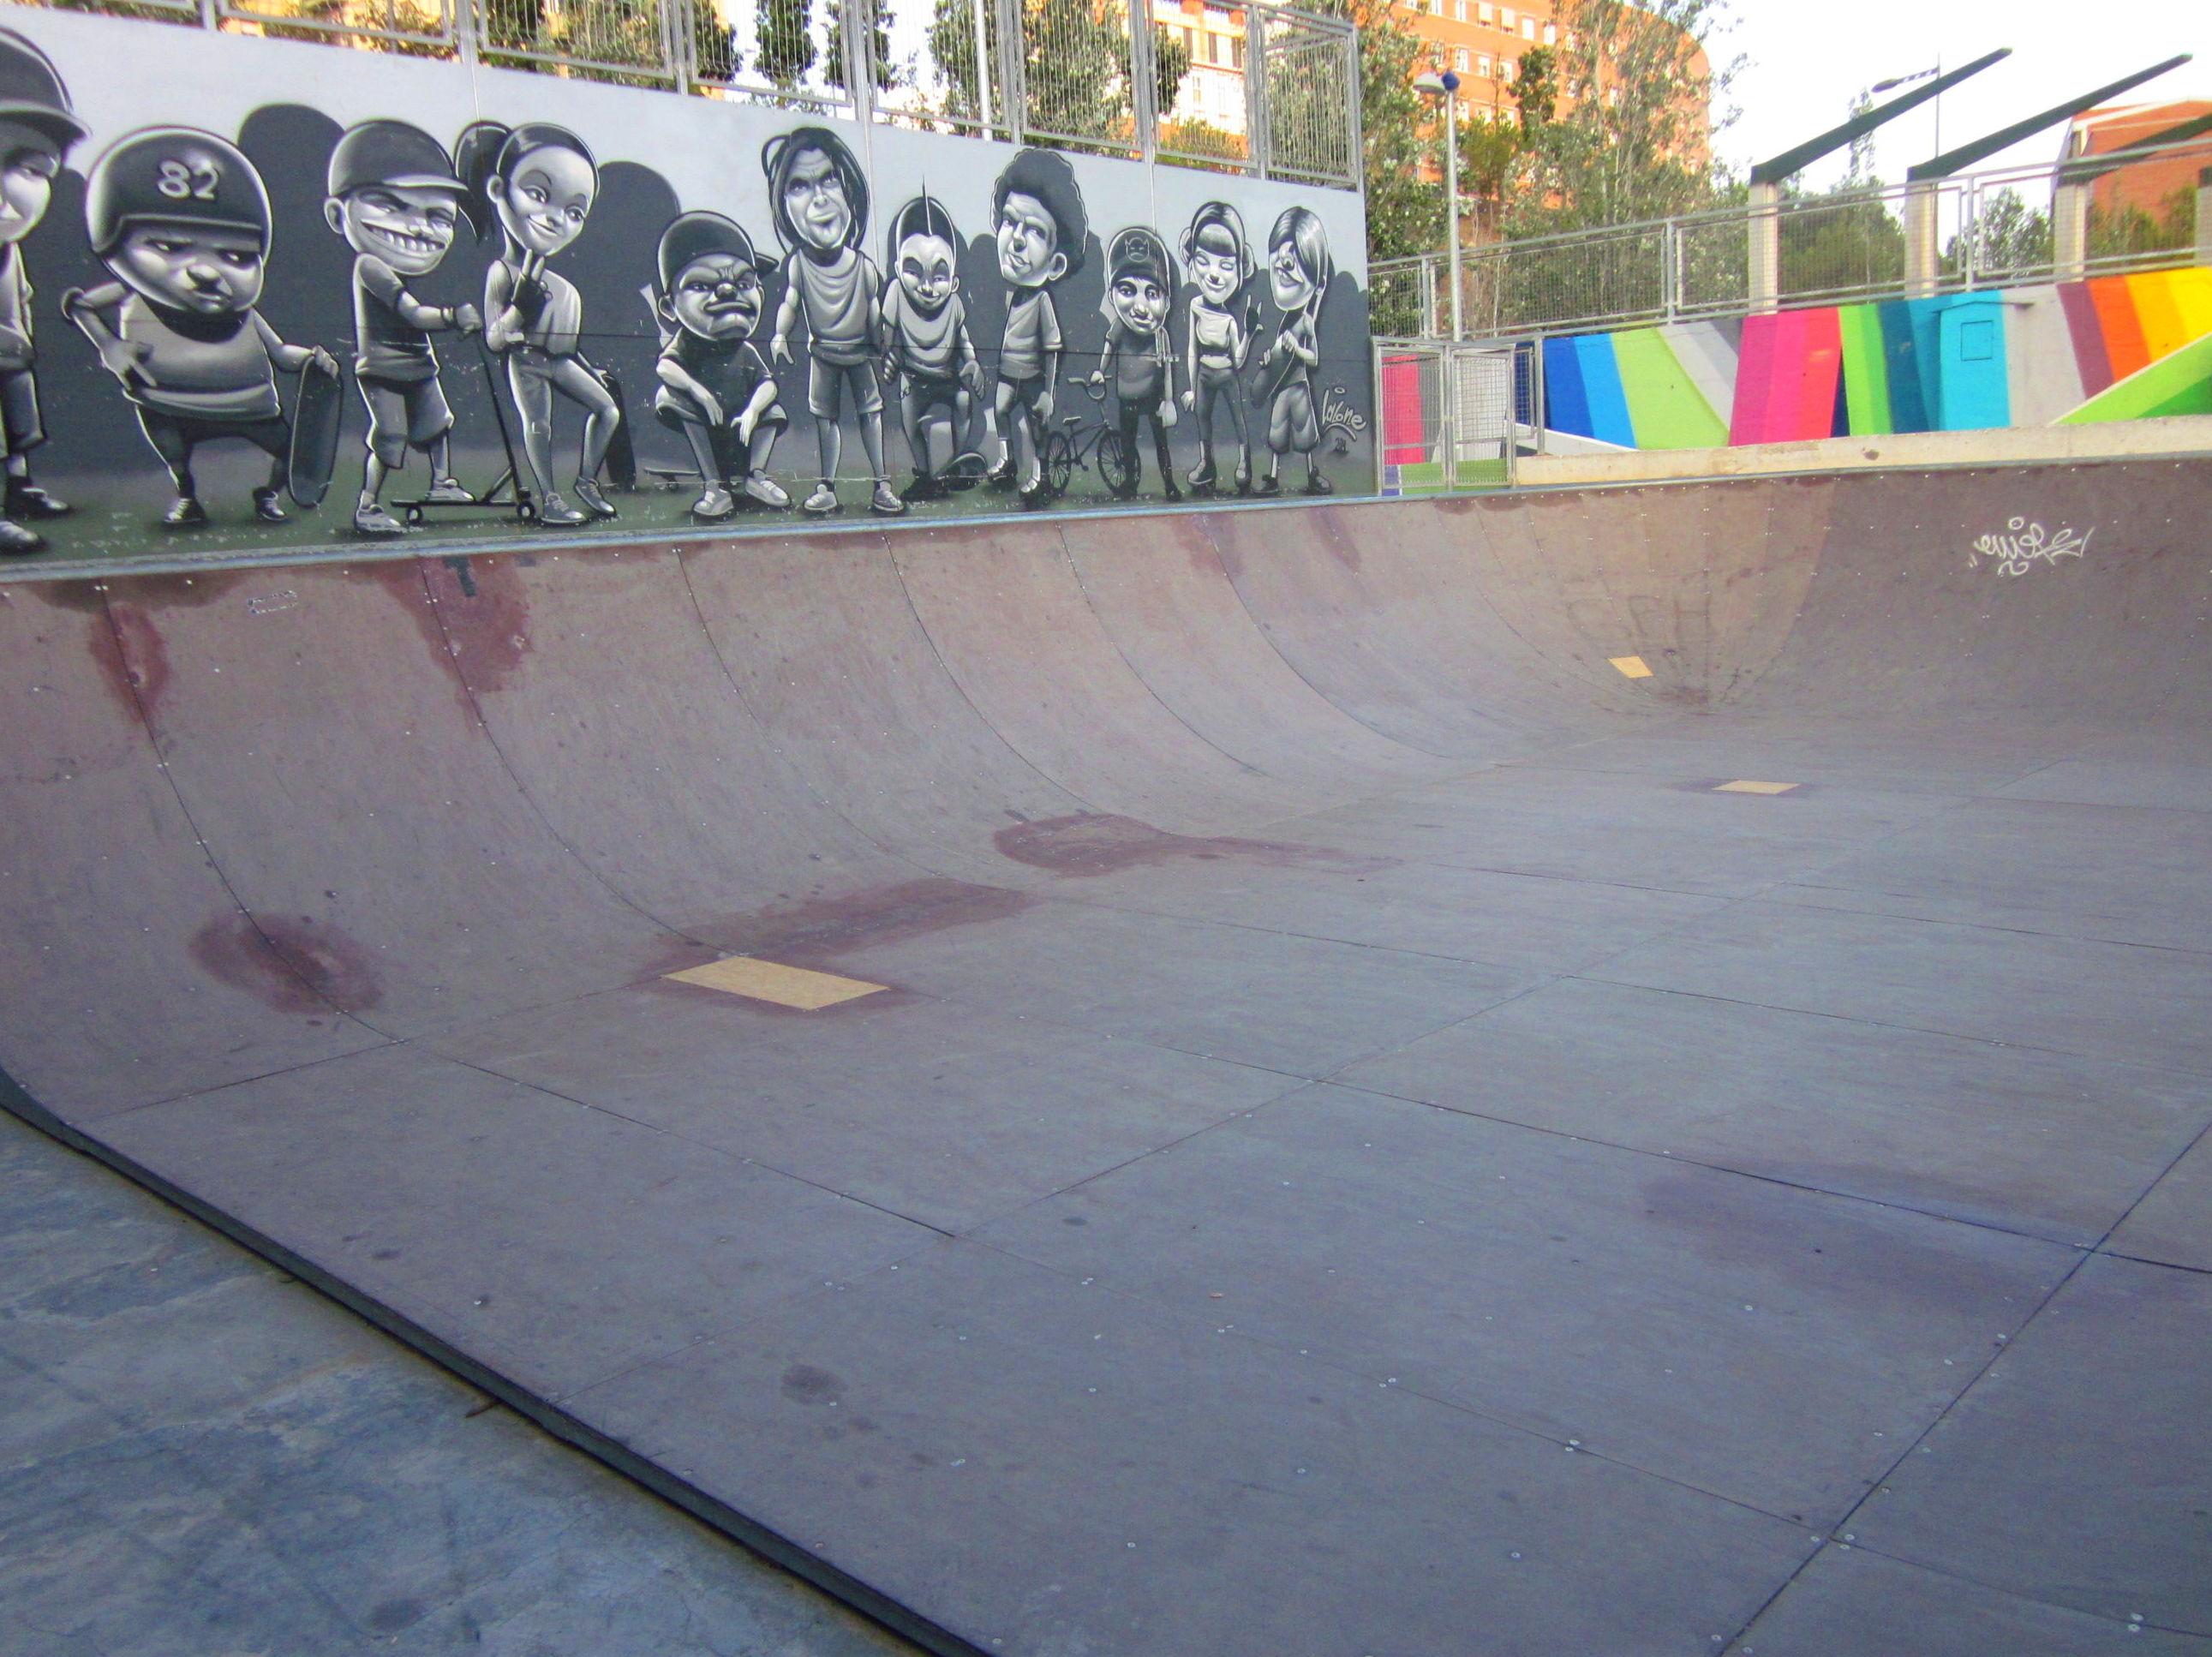 Foto 7 de Skate en Amorebieta | Transformers Skateparks